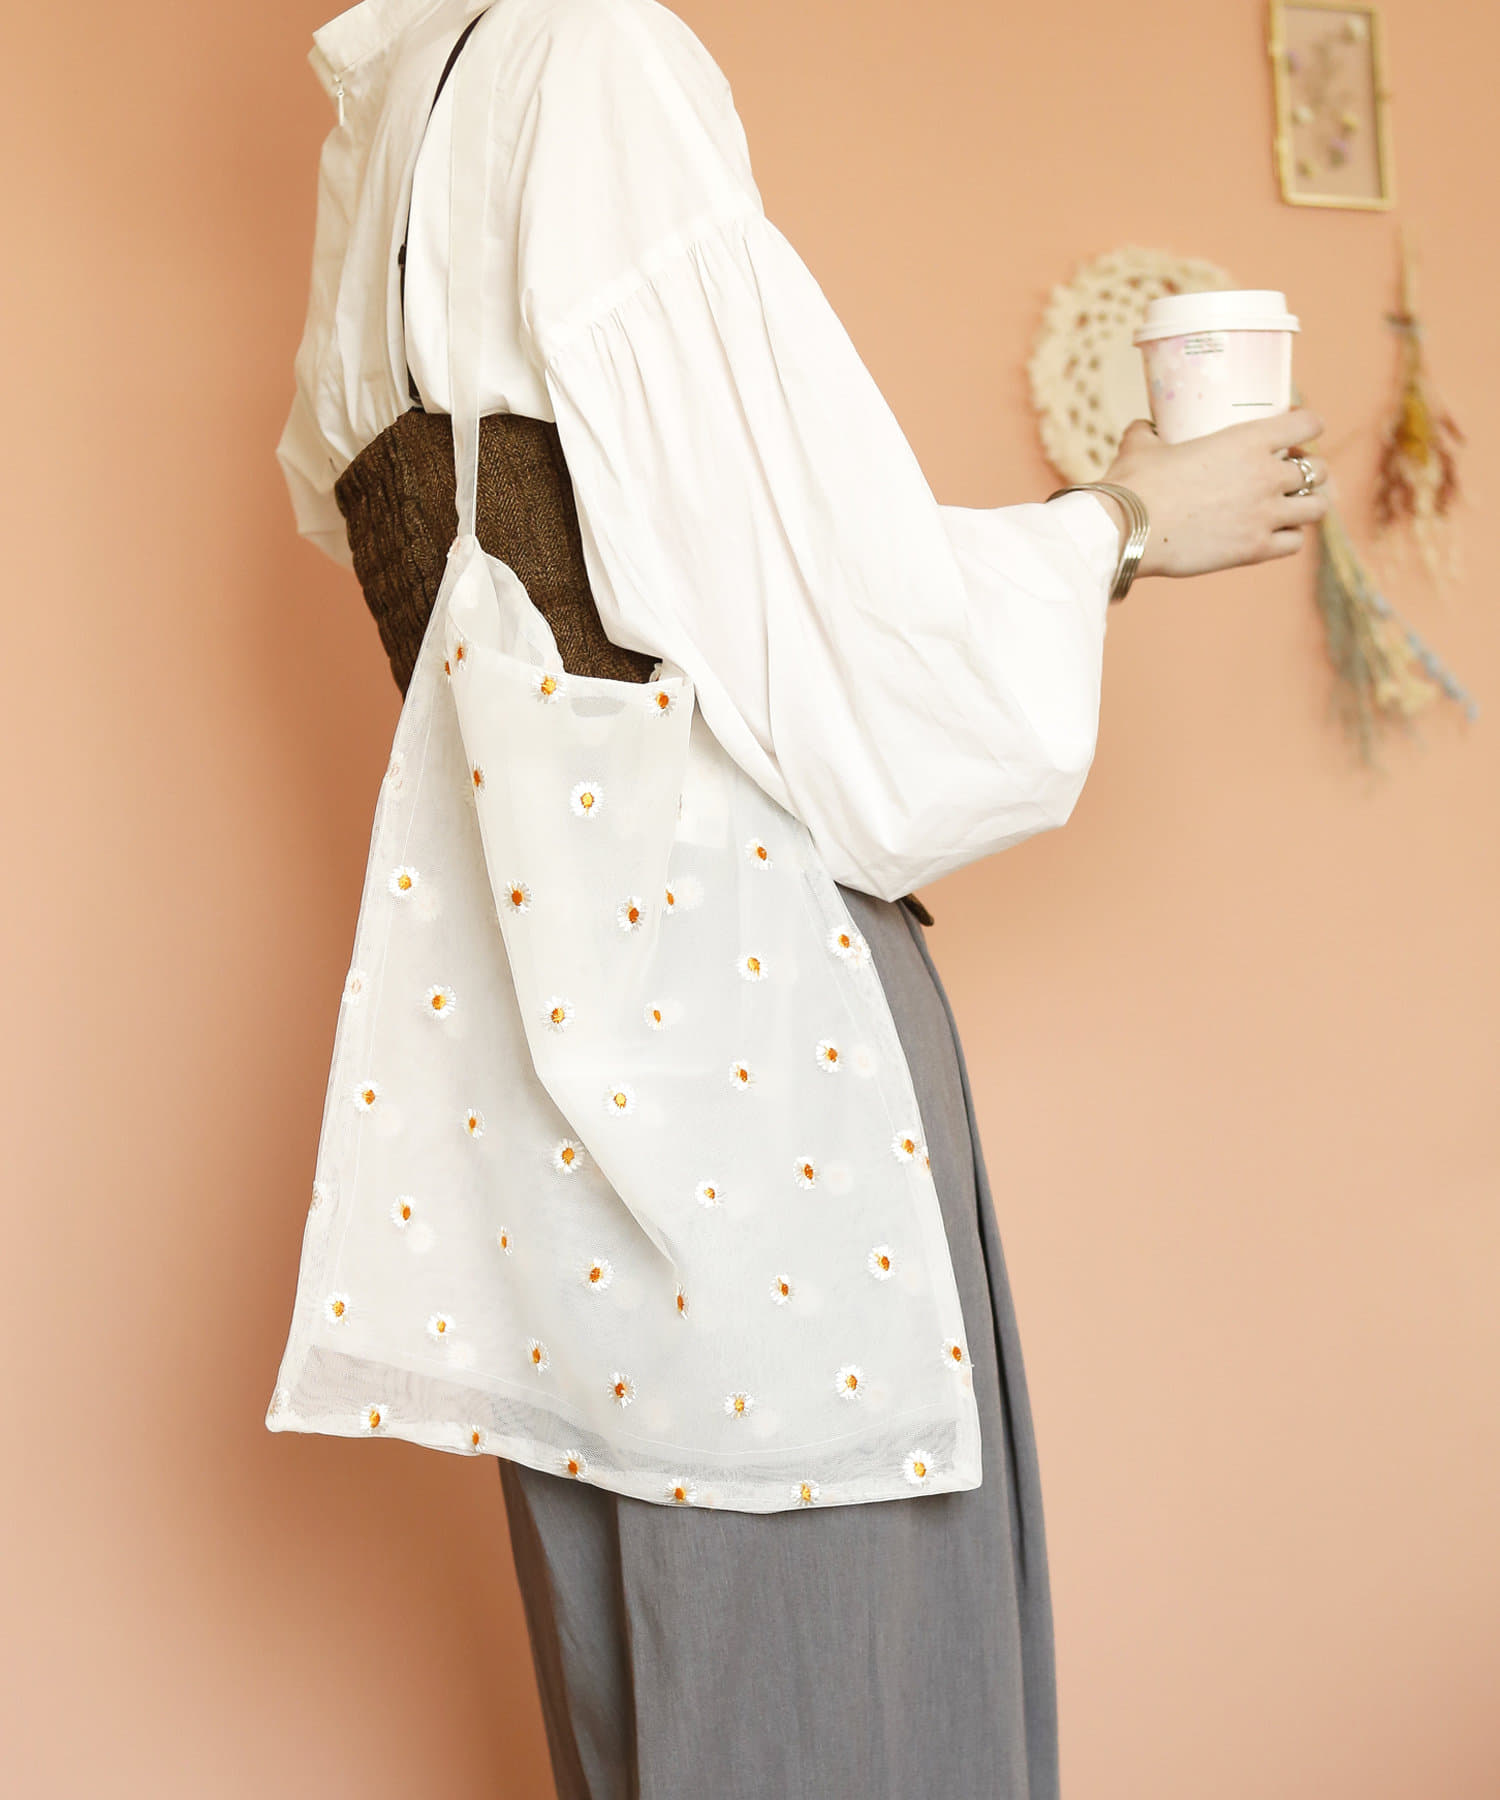 3COINS(スリーコインズ) 【ASOKO】【fem fem fem】刺繍ワンショルダーバッグ